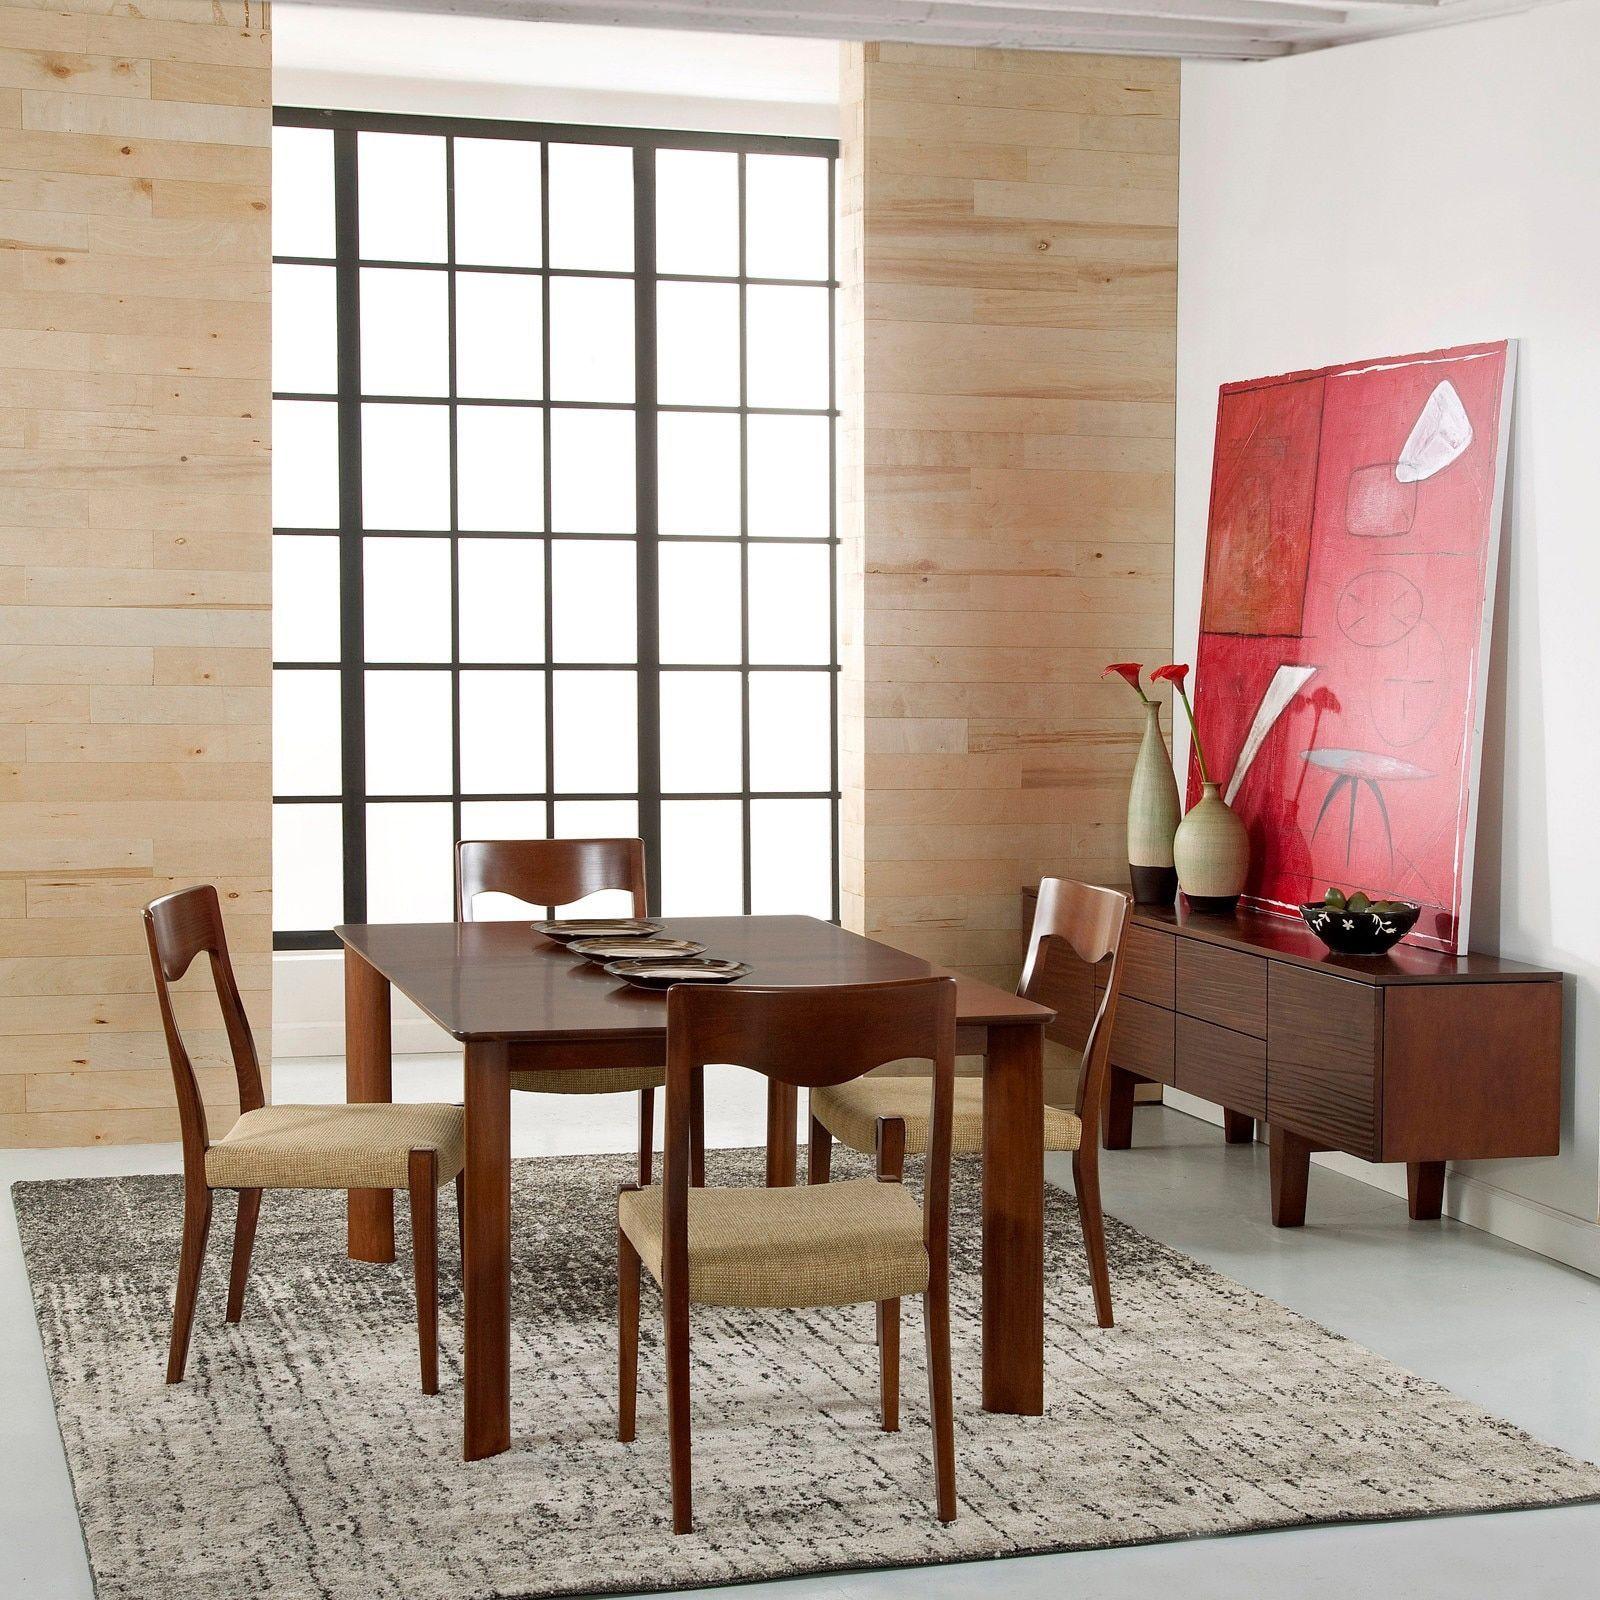 Saloom ari 36 x 72 rectangular maple smooth top dining table in walnut brown finish walnut